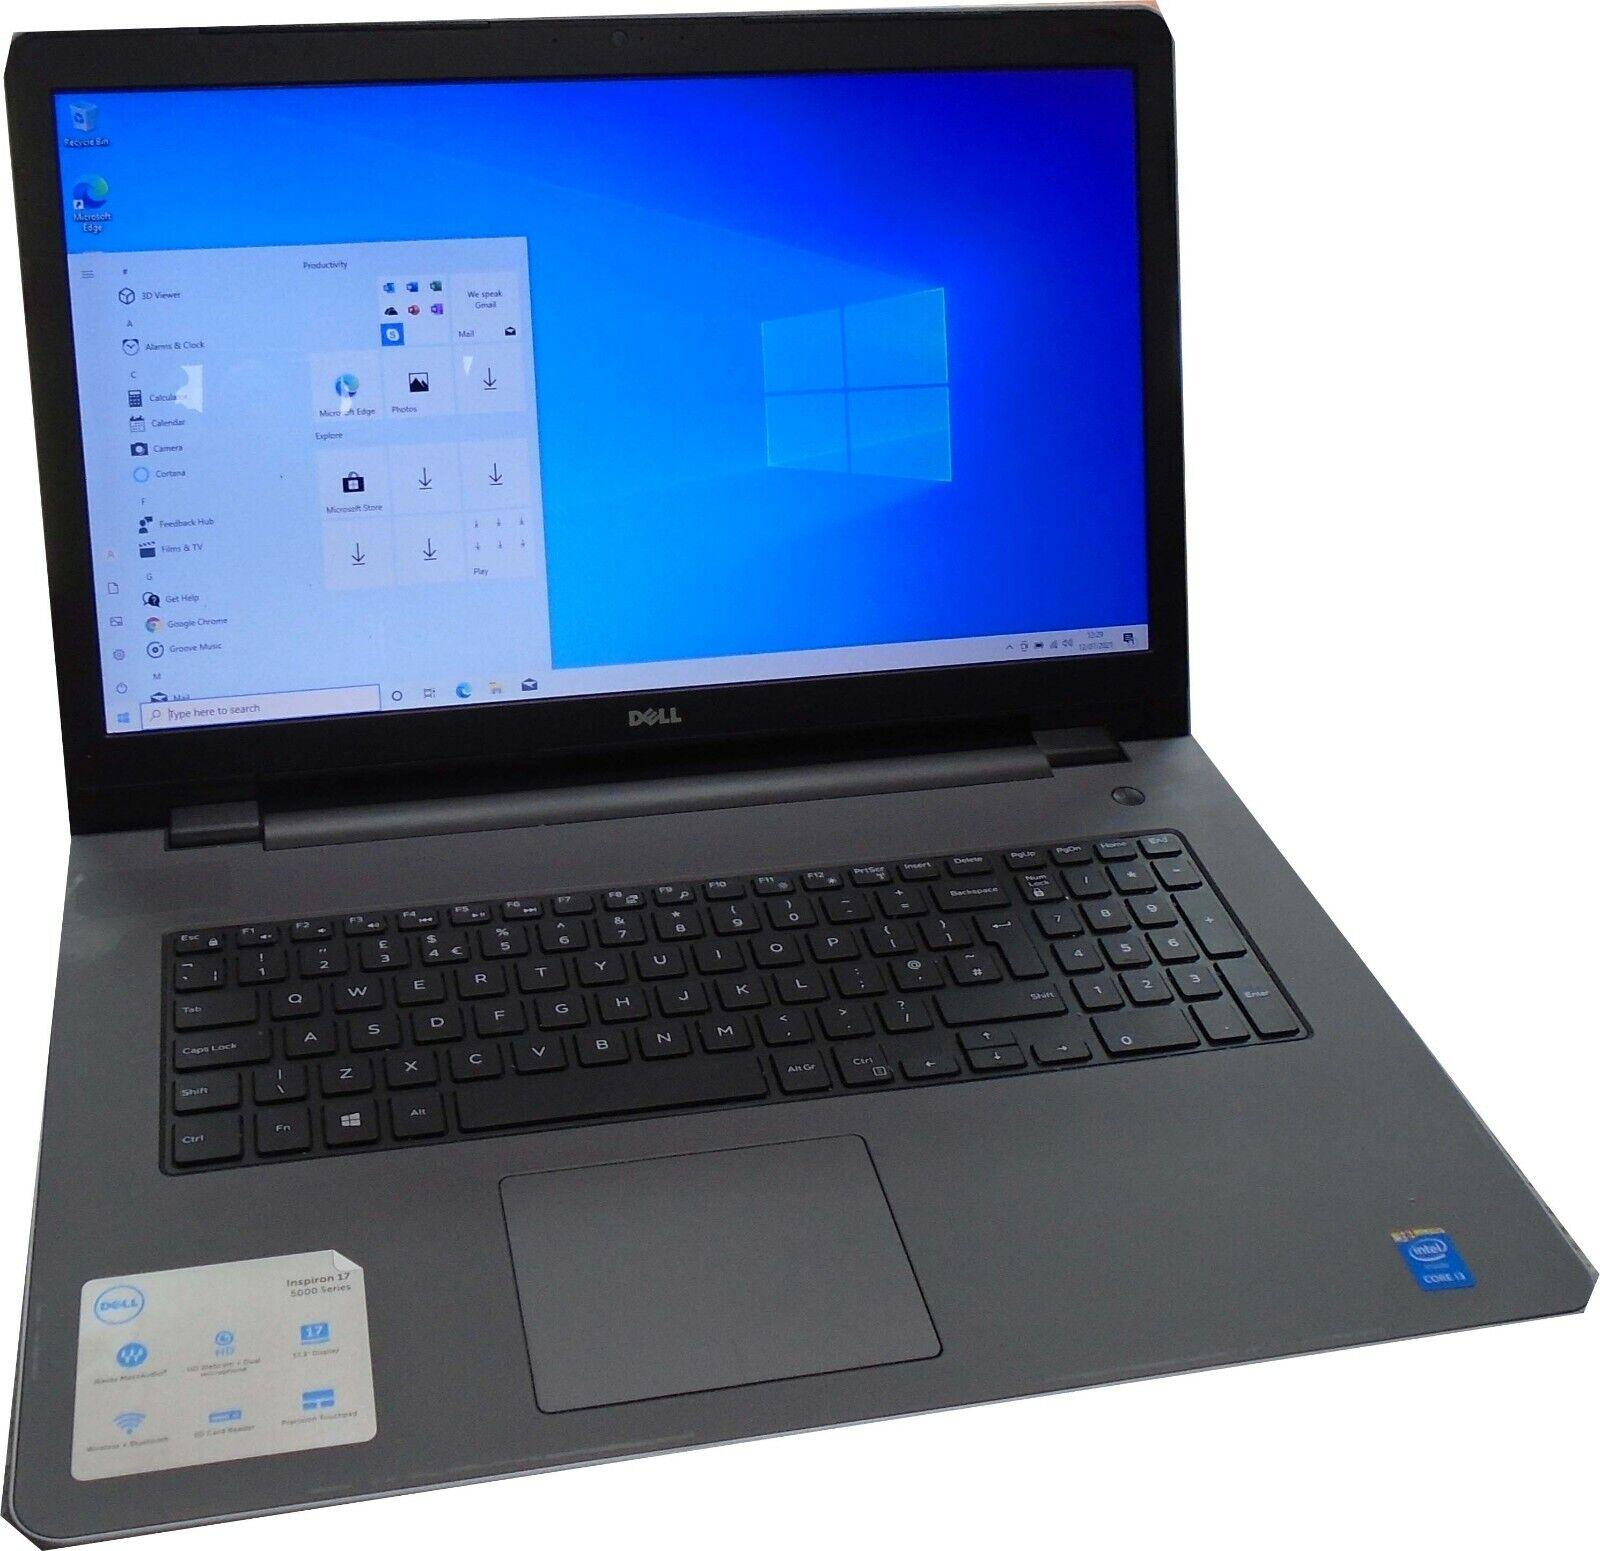 "Laptop Windows - 17""  laptop Dell Inspiron 5758 Intel i3 8gB RAM 120GB SSD Windows 10 Home"